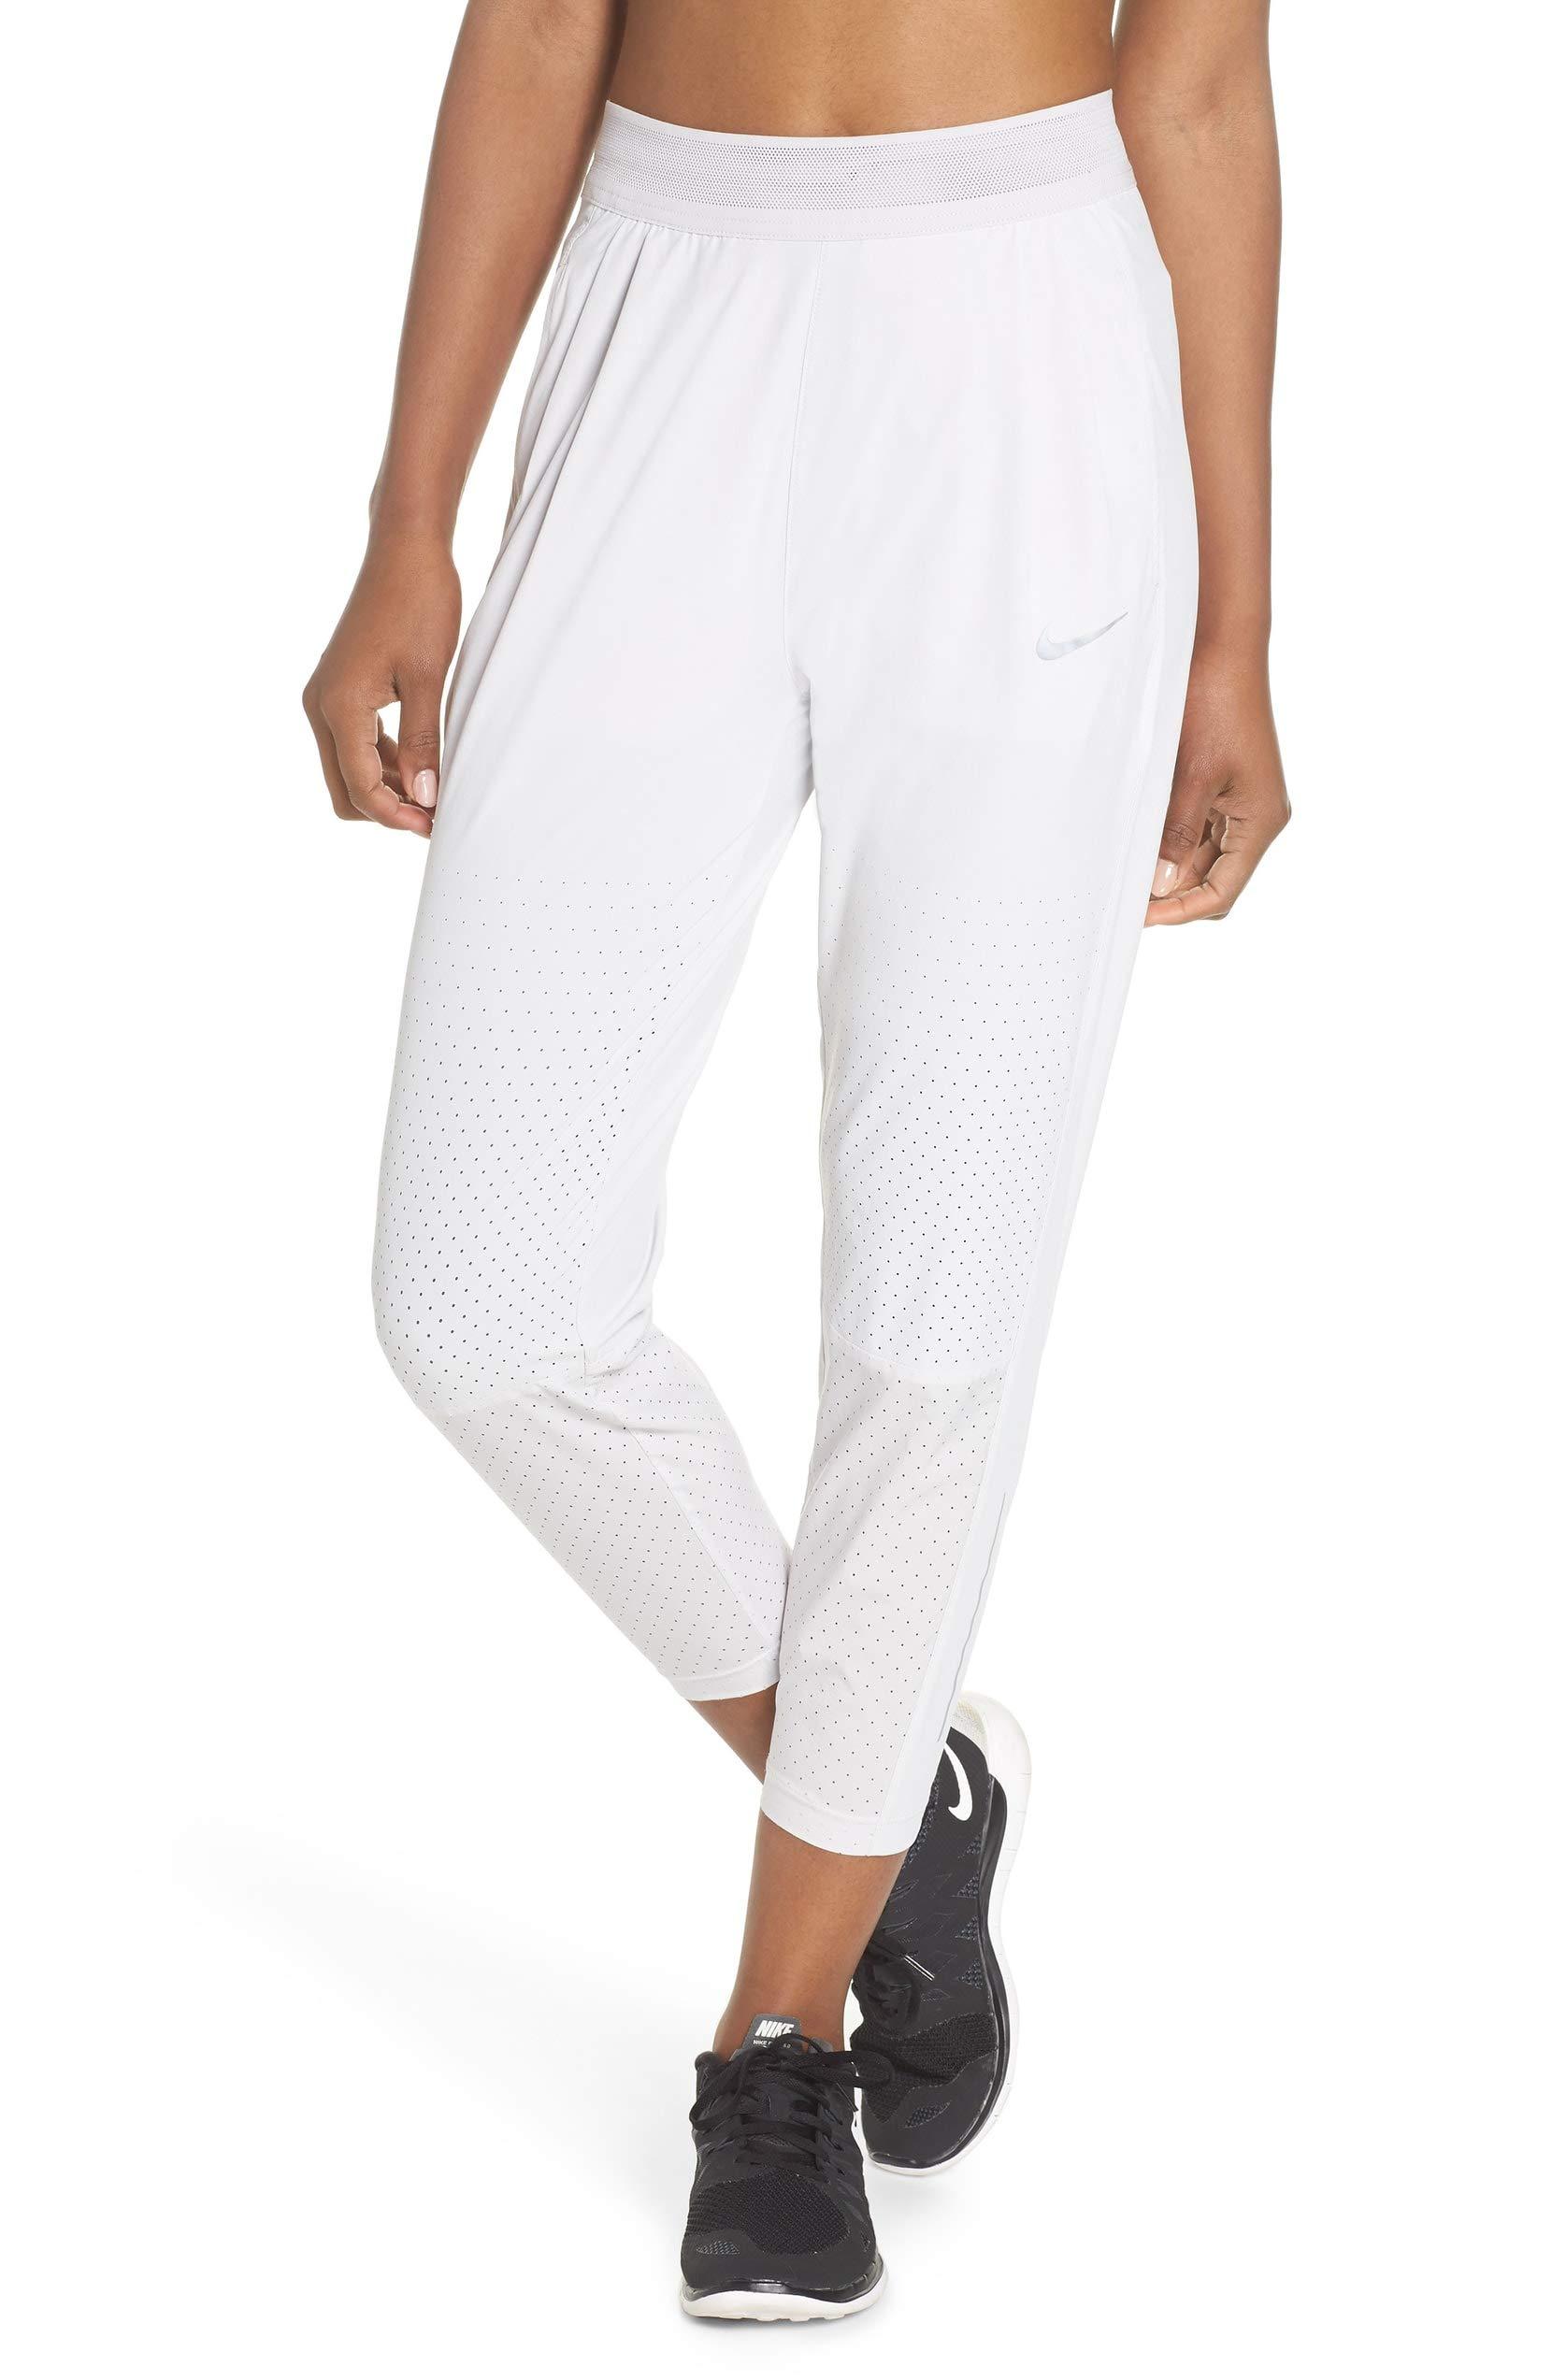 Nike Womens Dri-Fit Flex Running Division Pants Vast Grey 923416-092 (Medium)